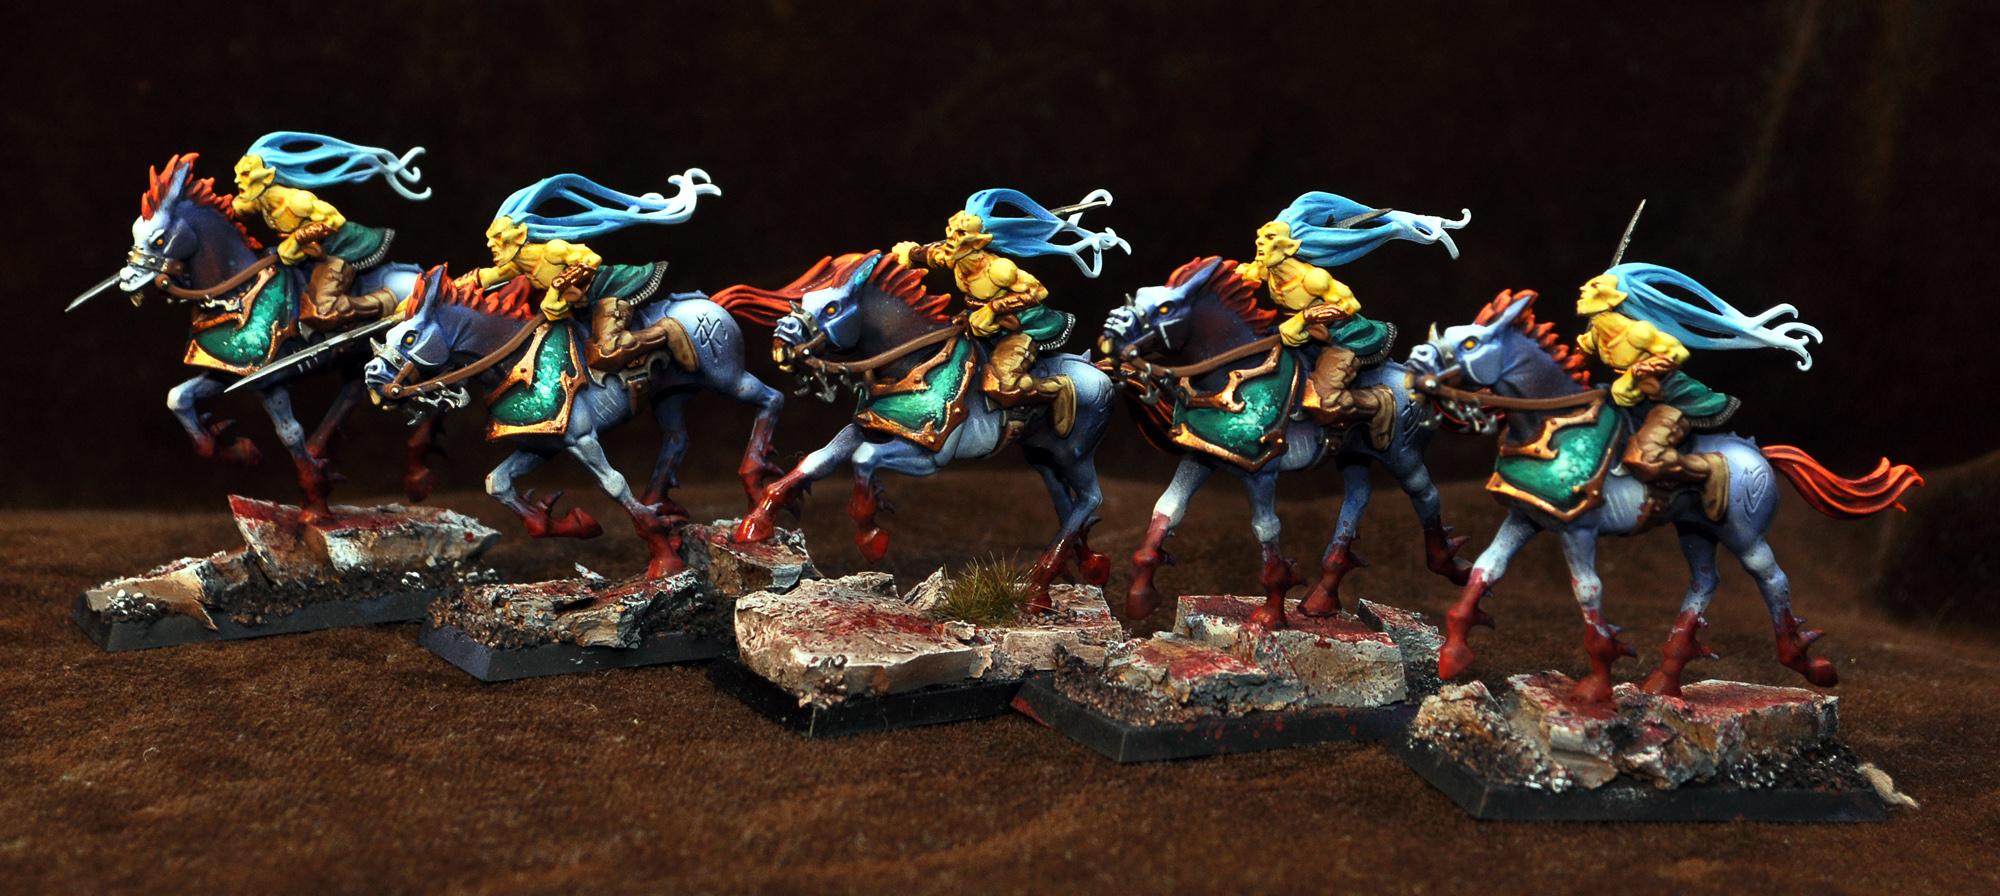 CoolMiniOrNot Doomfire Warlocks By XHaramx